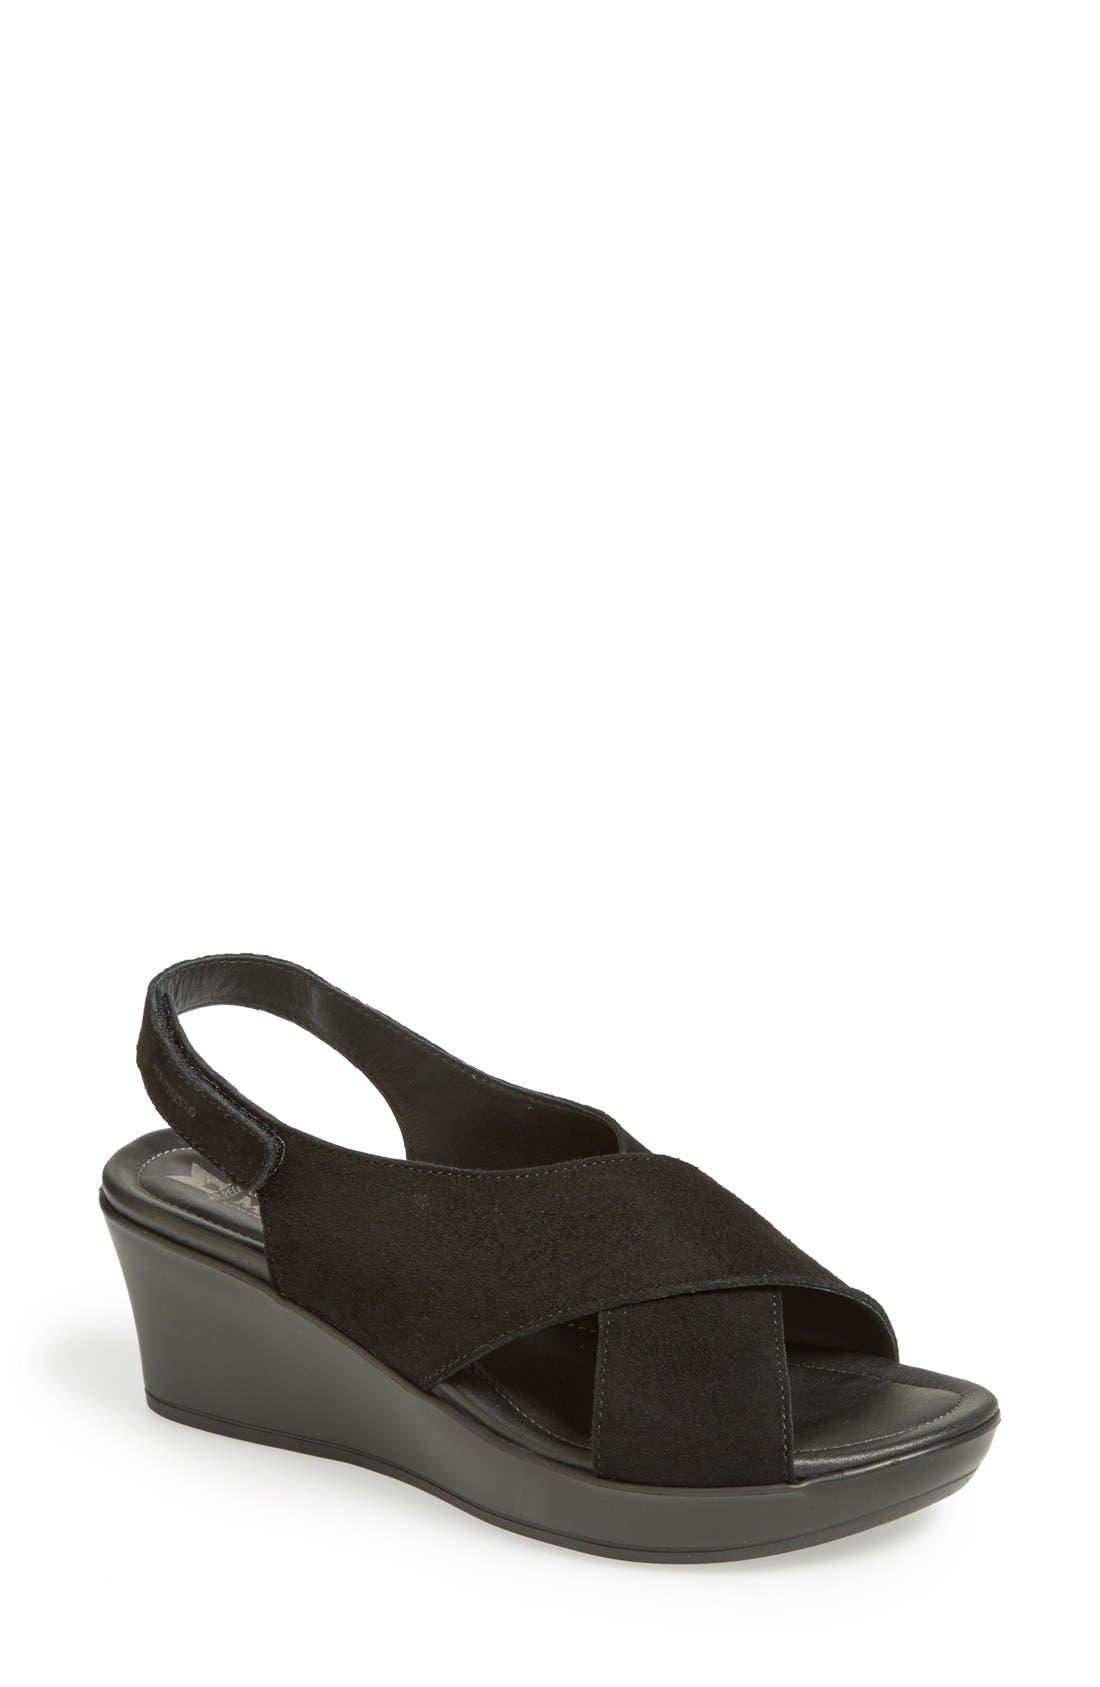 Main Image - Mephisto 'Petra' Sandal